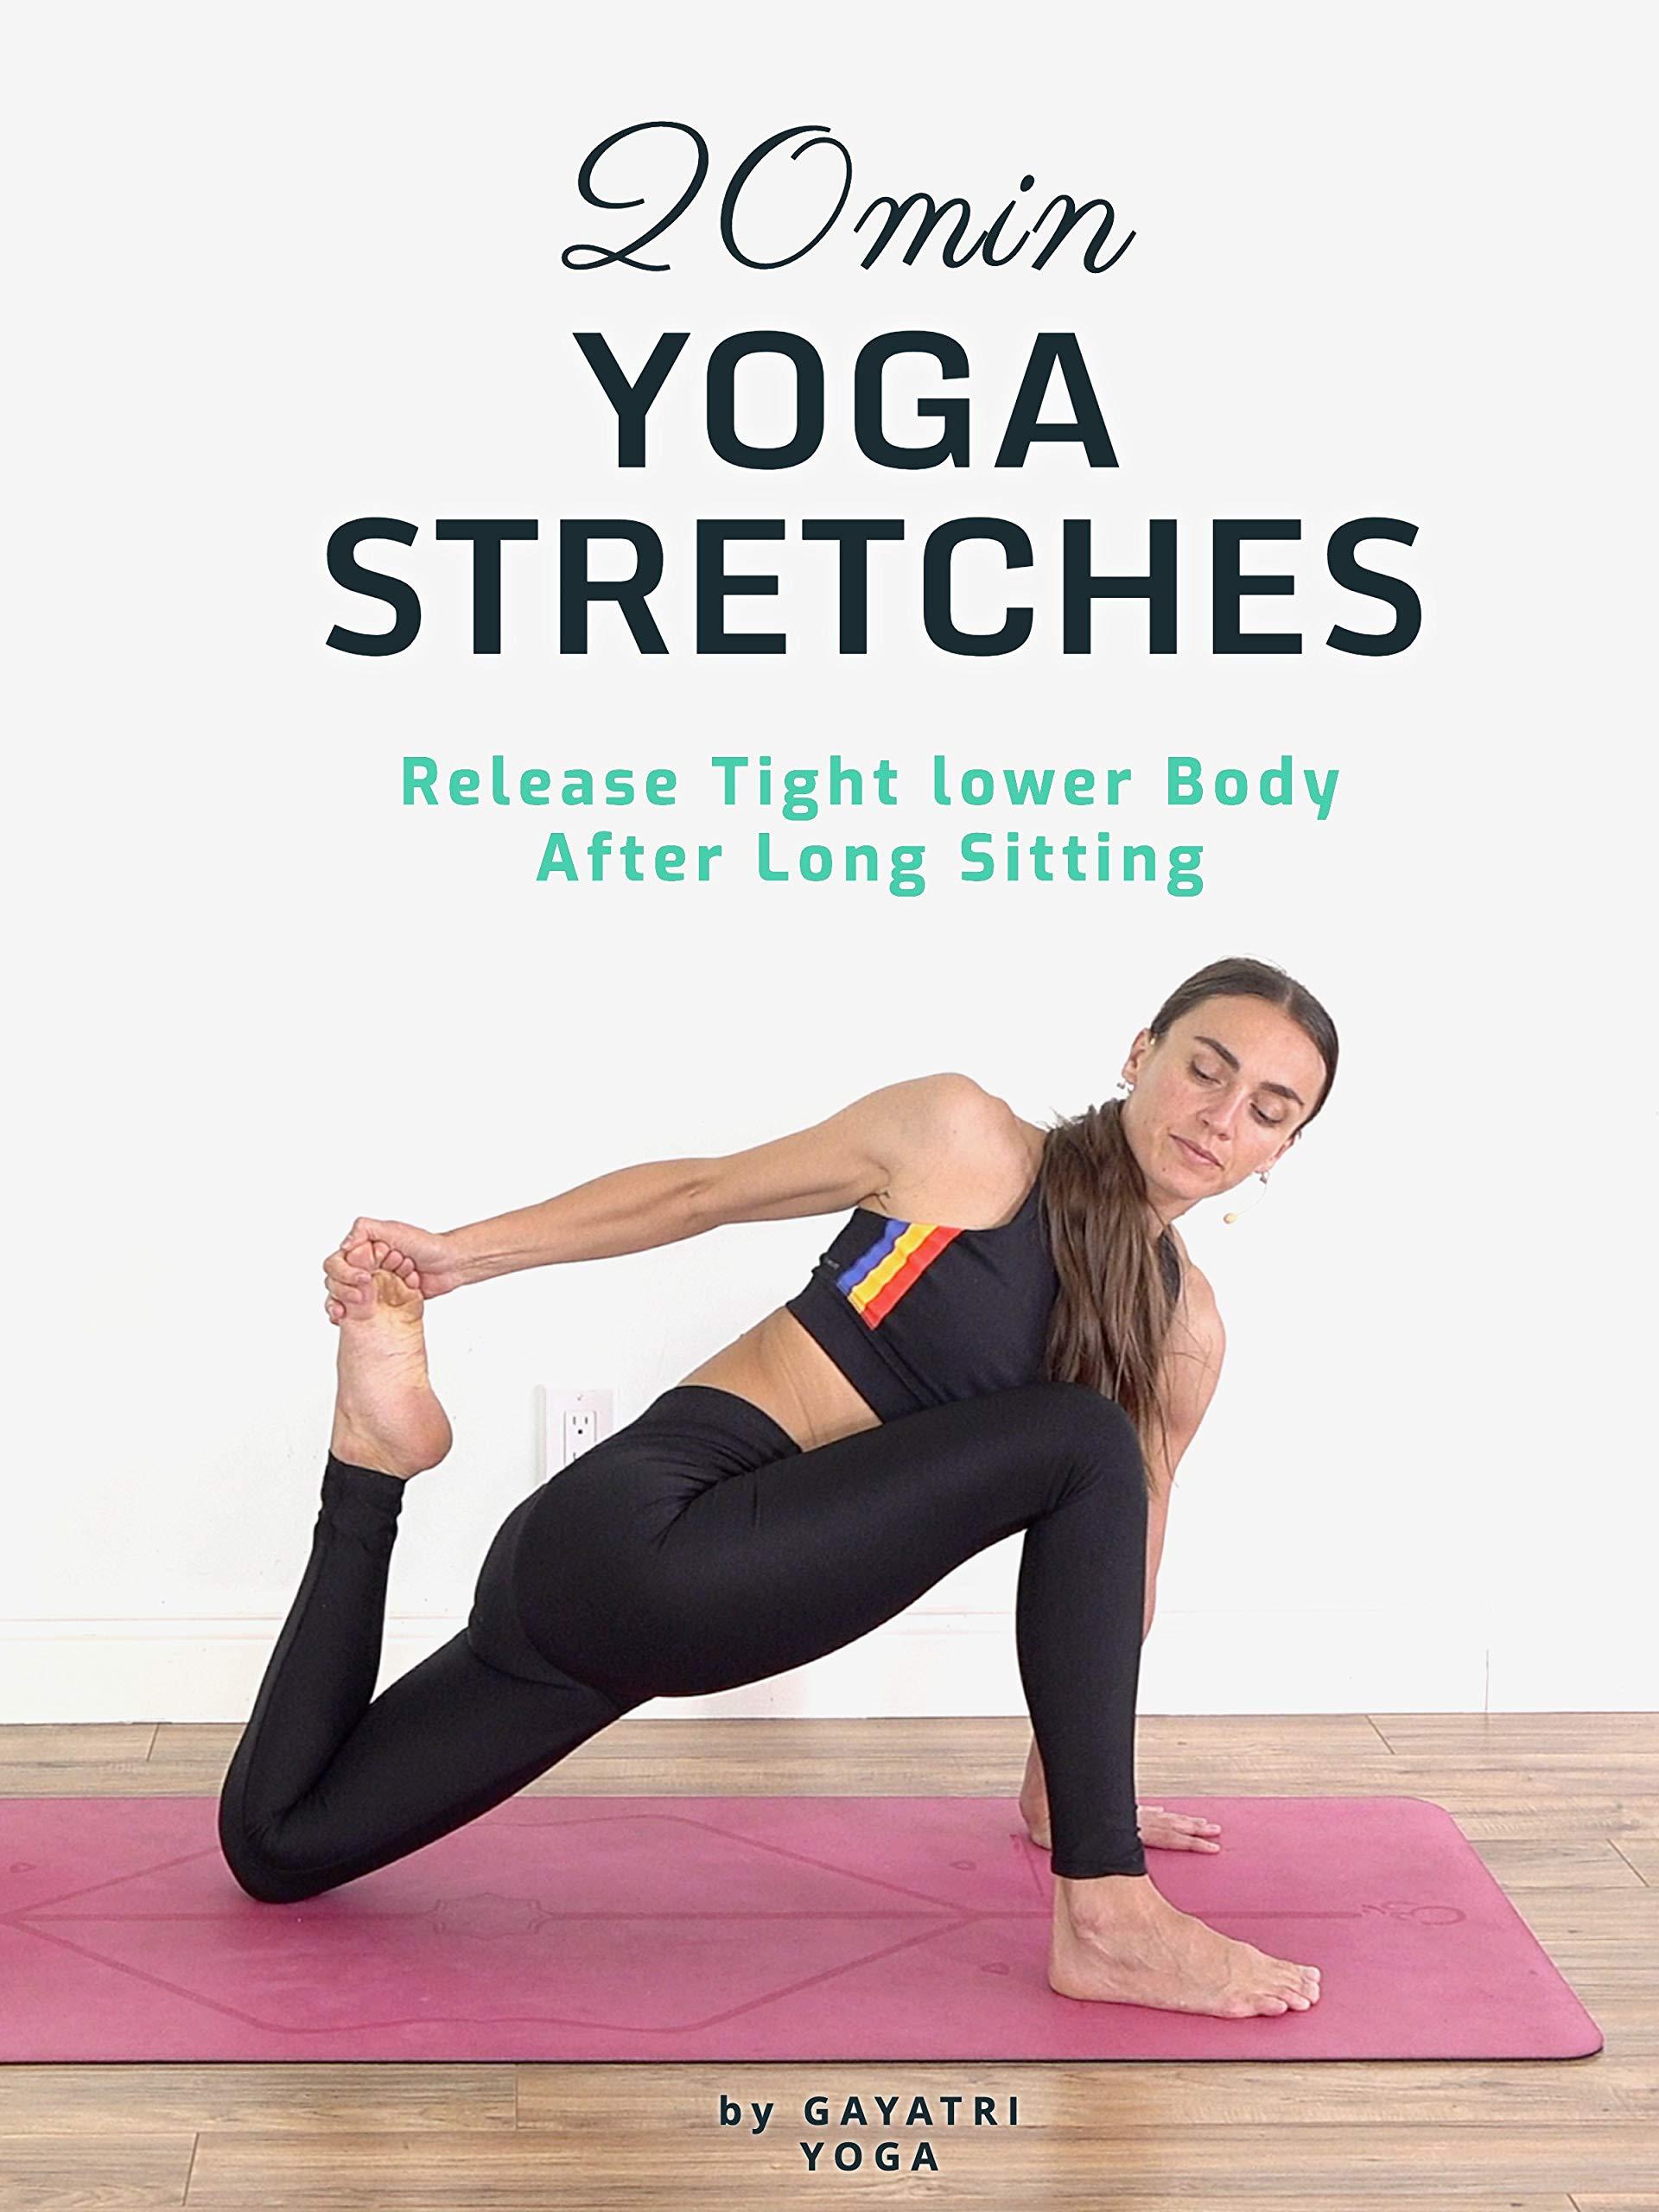 20 Min Yoga Stretches - Release Tight lower Body After Long Sitting - Gayatri Yoga